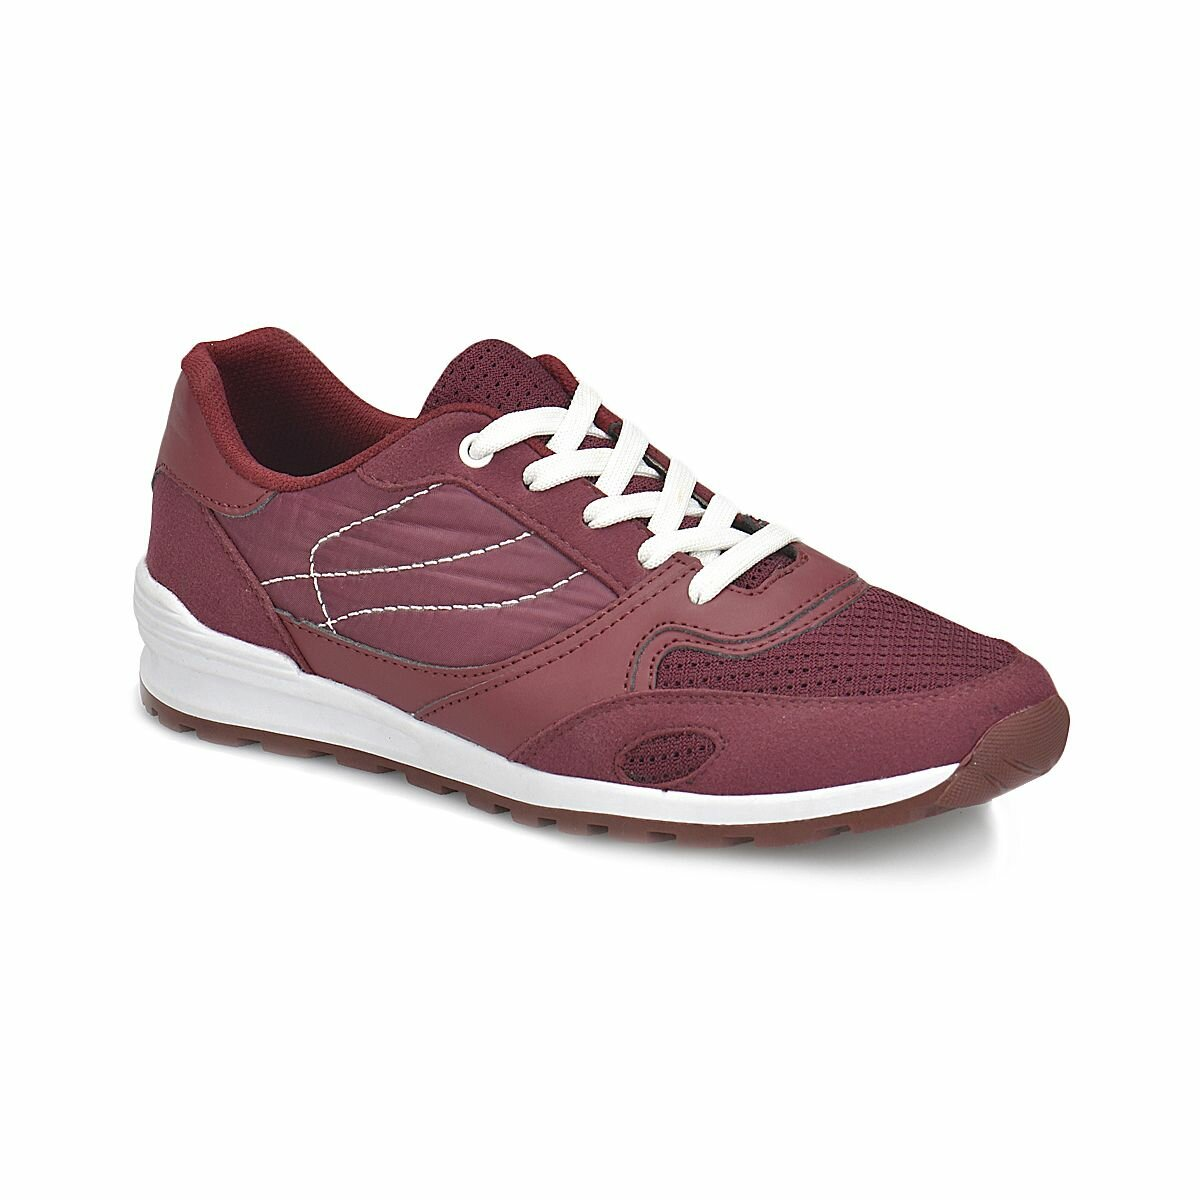 FLO PNM306.G Burgundy Male Child Sports Shoes Panama Club